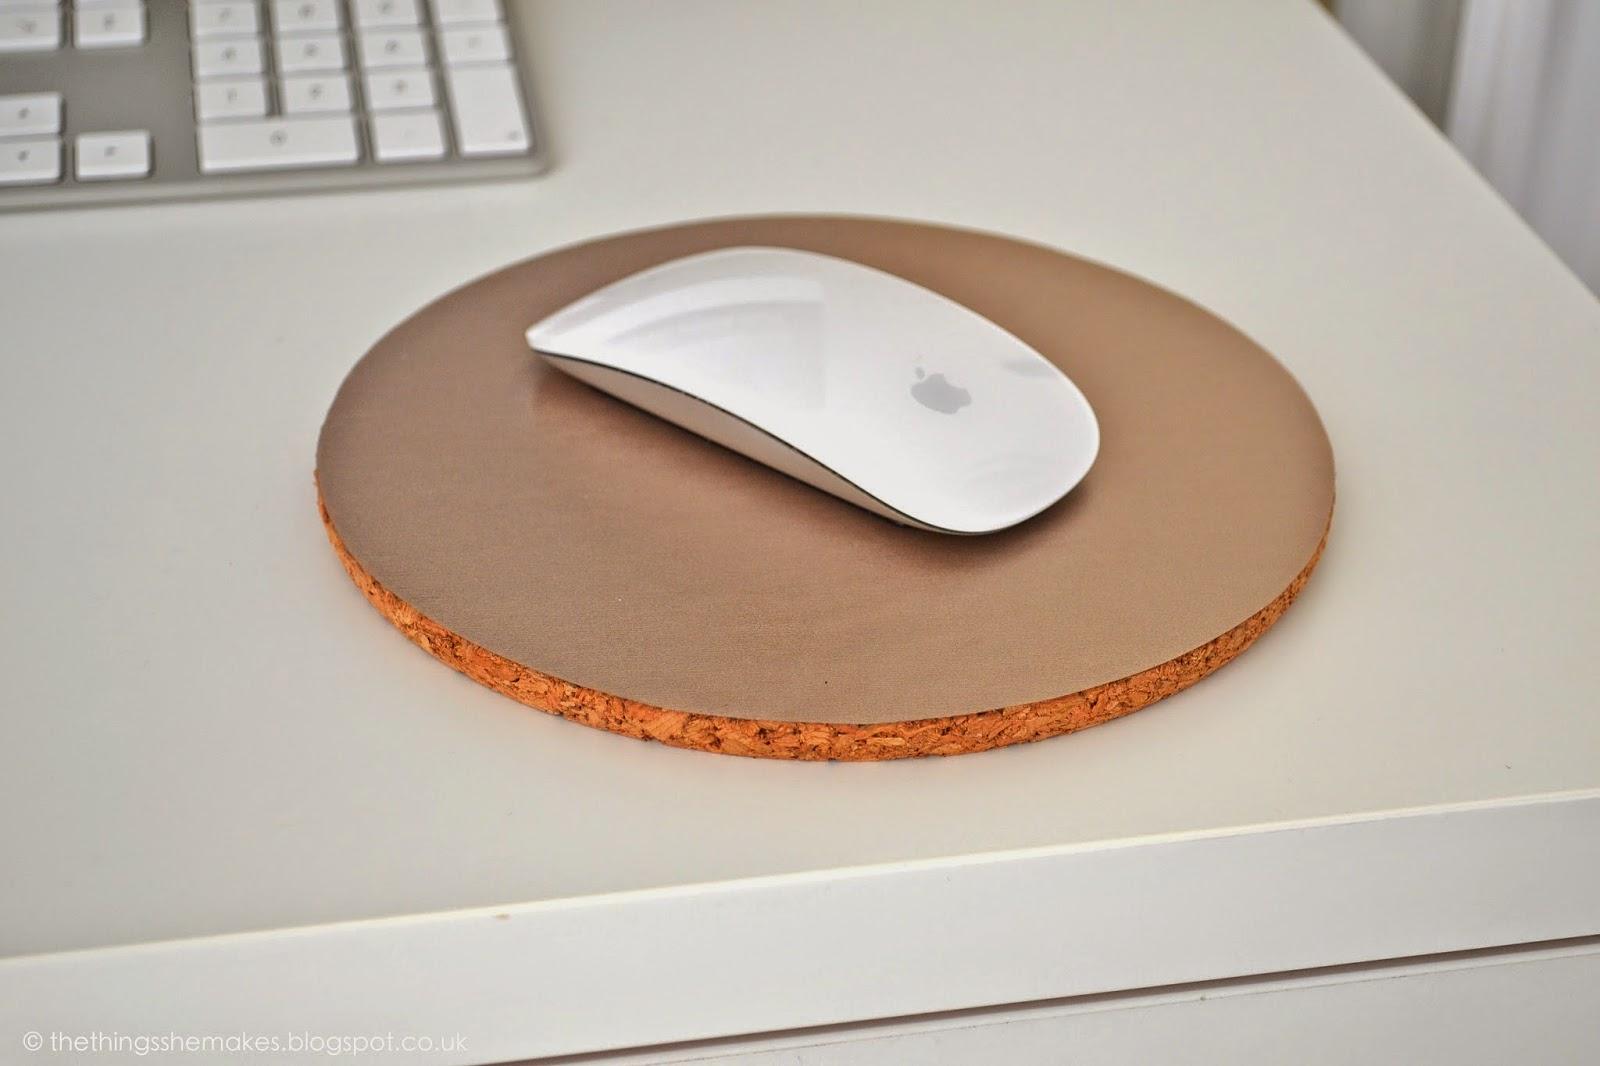 Fullsize Of Homemade Mouse Pad